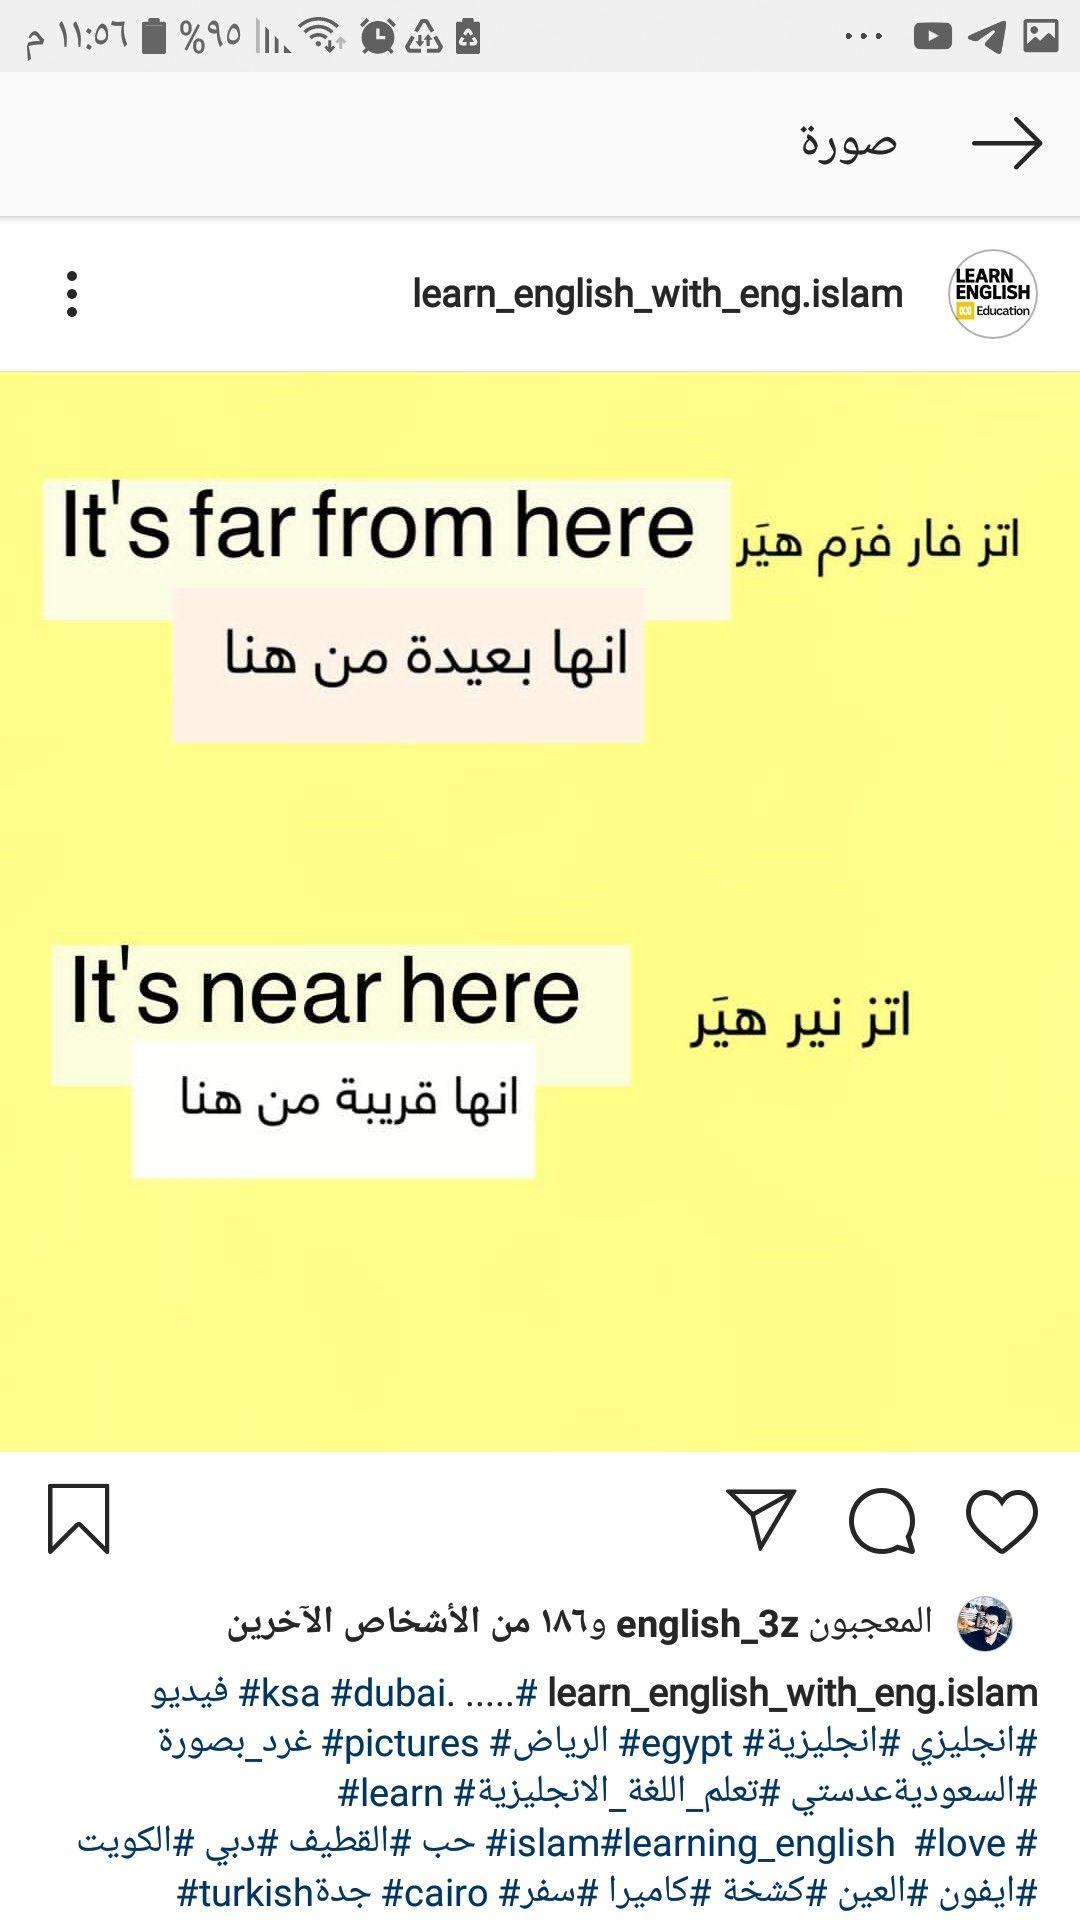 Learning Arabic Msa Fabienne Learn English English Language Teaching English Words